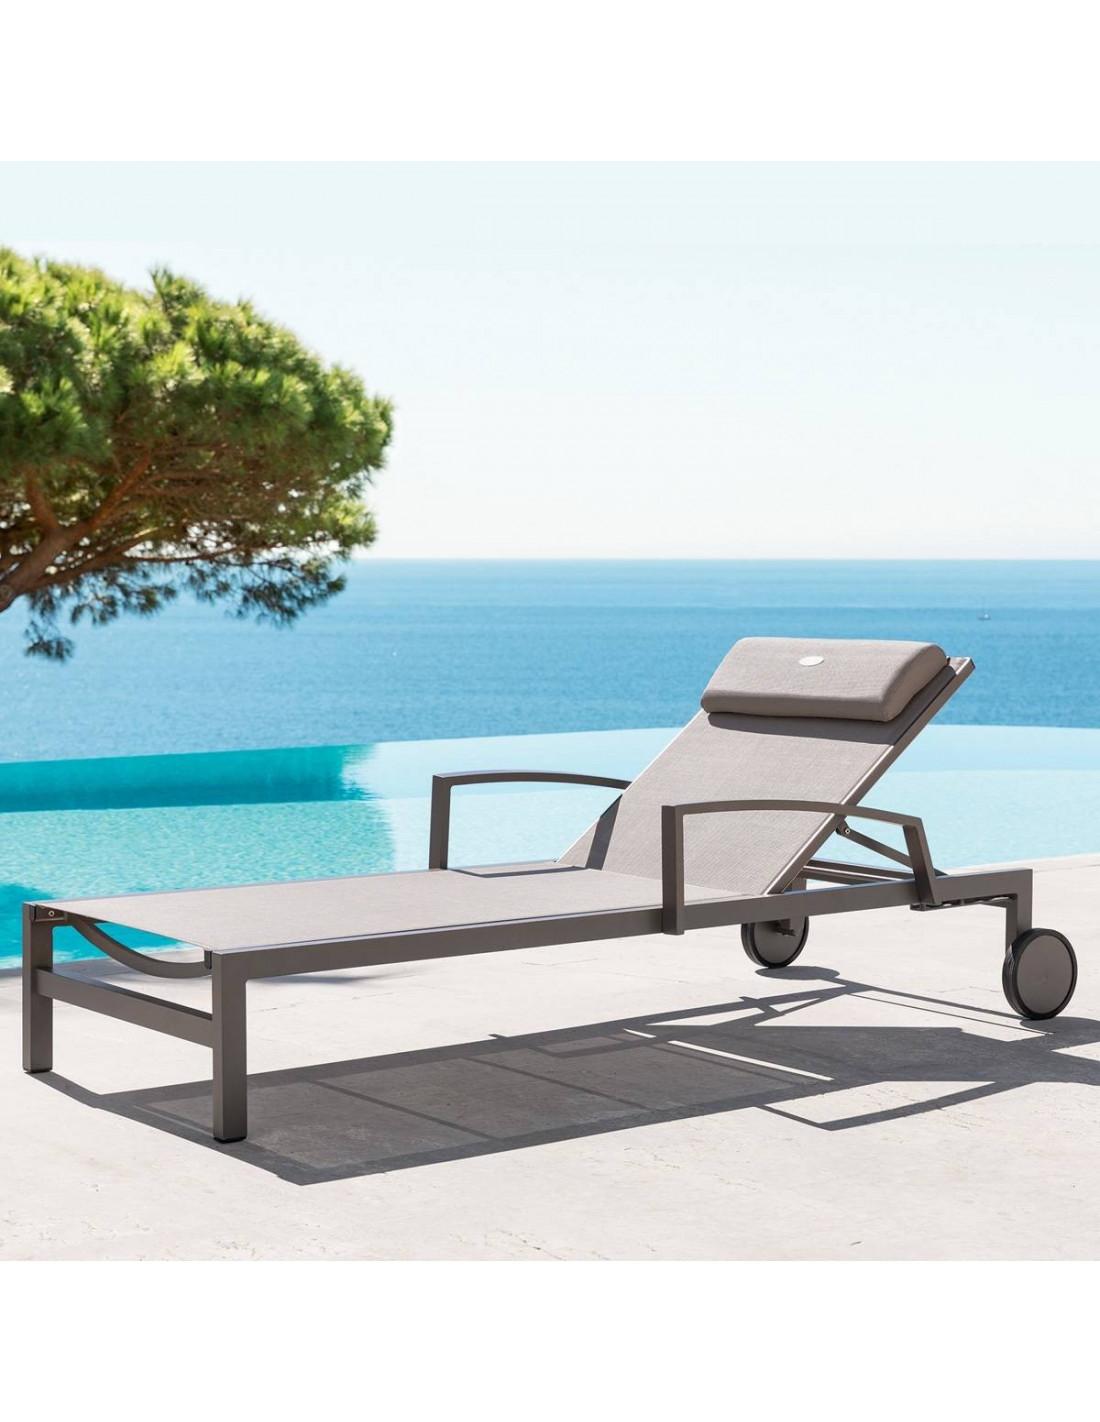 transat de jardin ocala 4 positions aluminium et texaline hesp ride. Black Bedroom Furniture Sets. Home Design Ideas